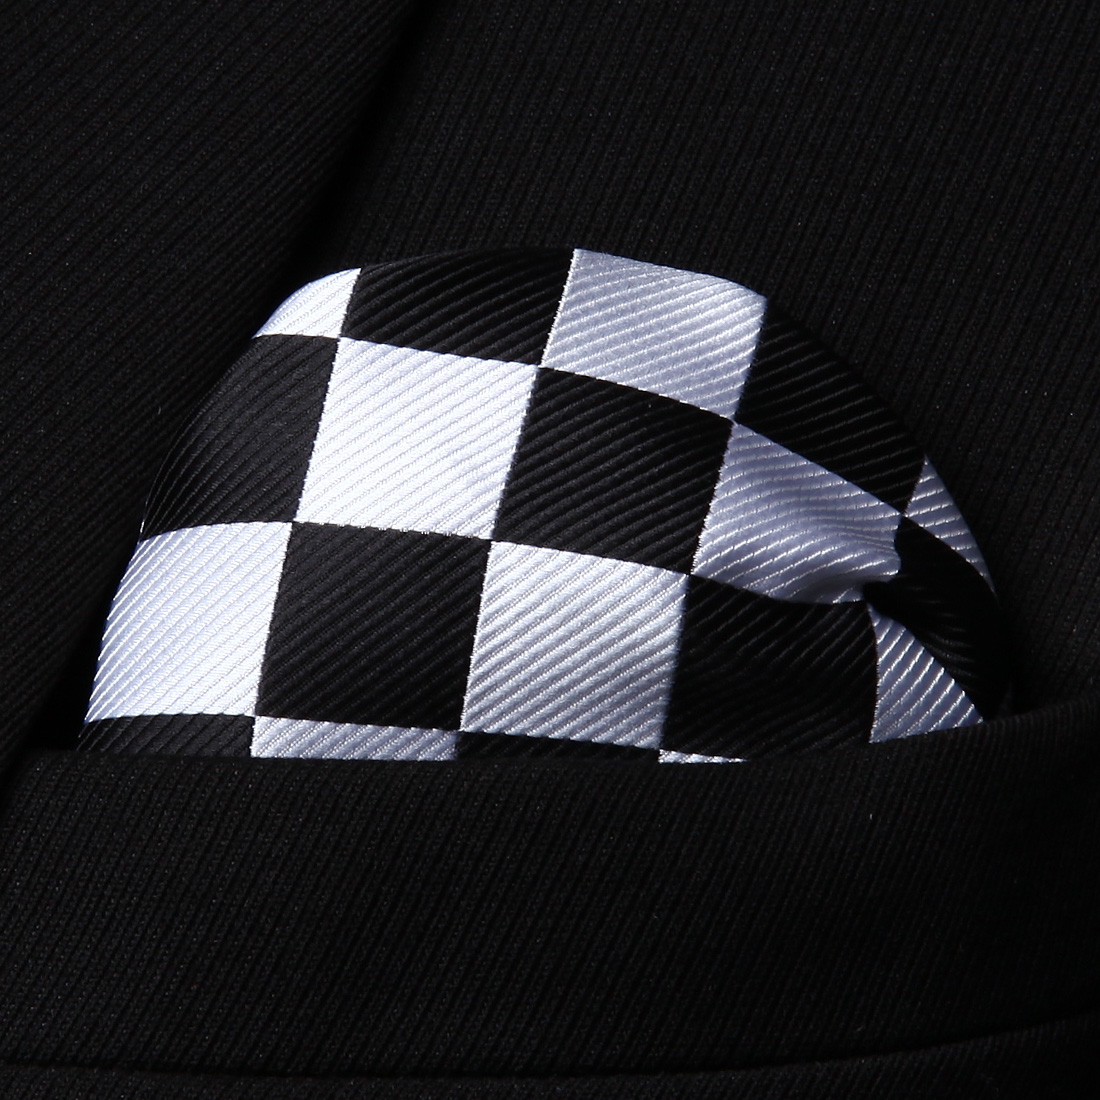 HC351L White Black Check Men 100% Silk Party Handkerchief Pocket Square Hanky